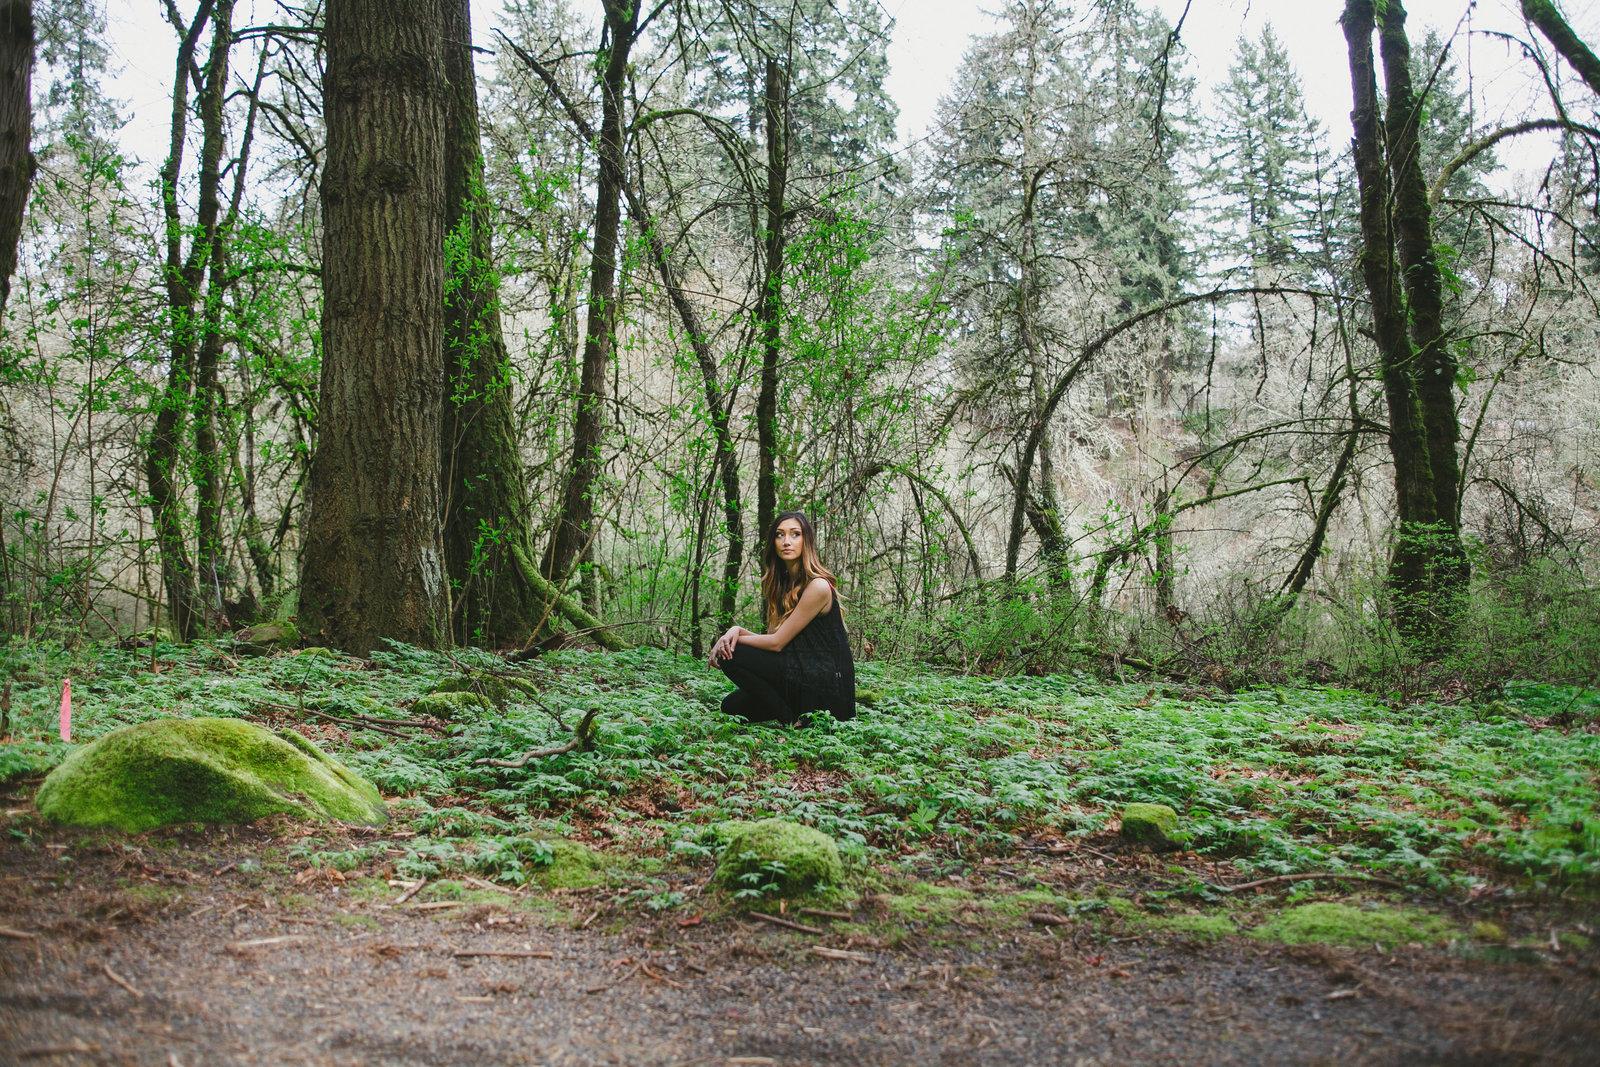 Outdoorsy Senior photography in Portland Oregon | Susie Moreno Photography